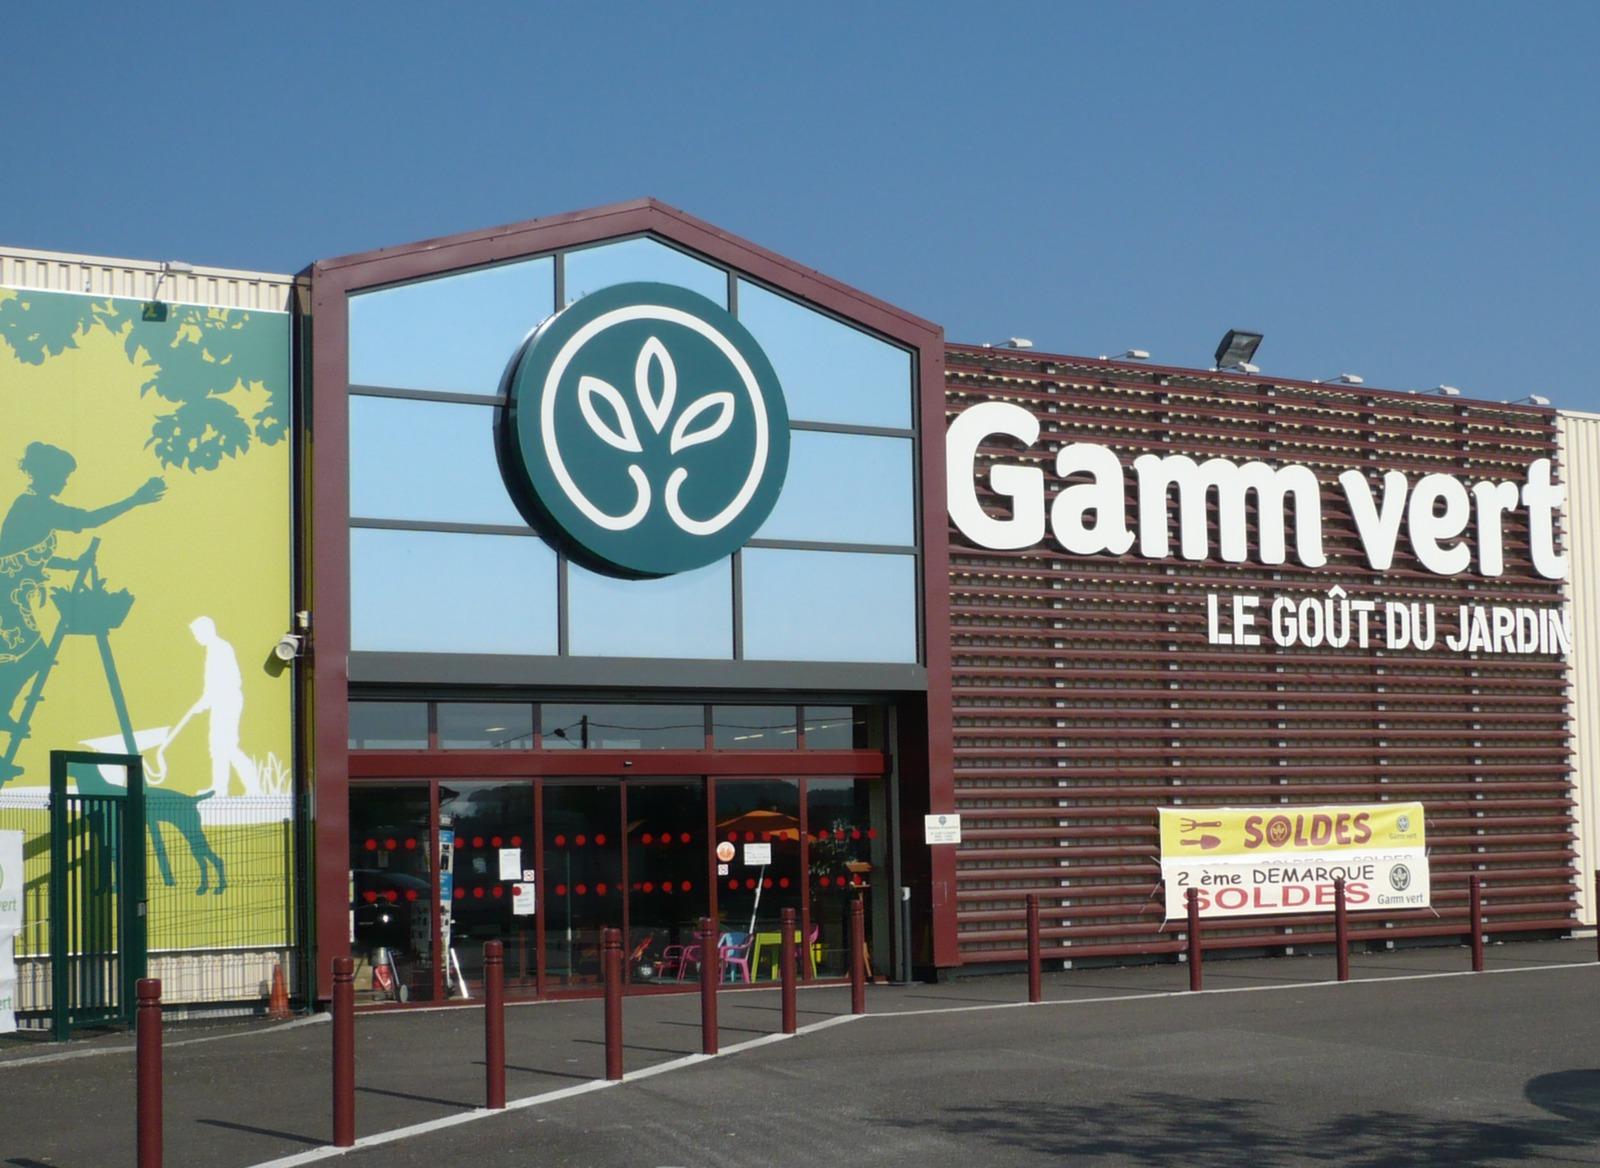 GAMM VERT CASTELJALOUX - CASTELJALOUX - Lot et Garonne